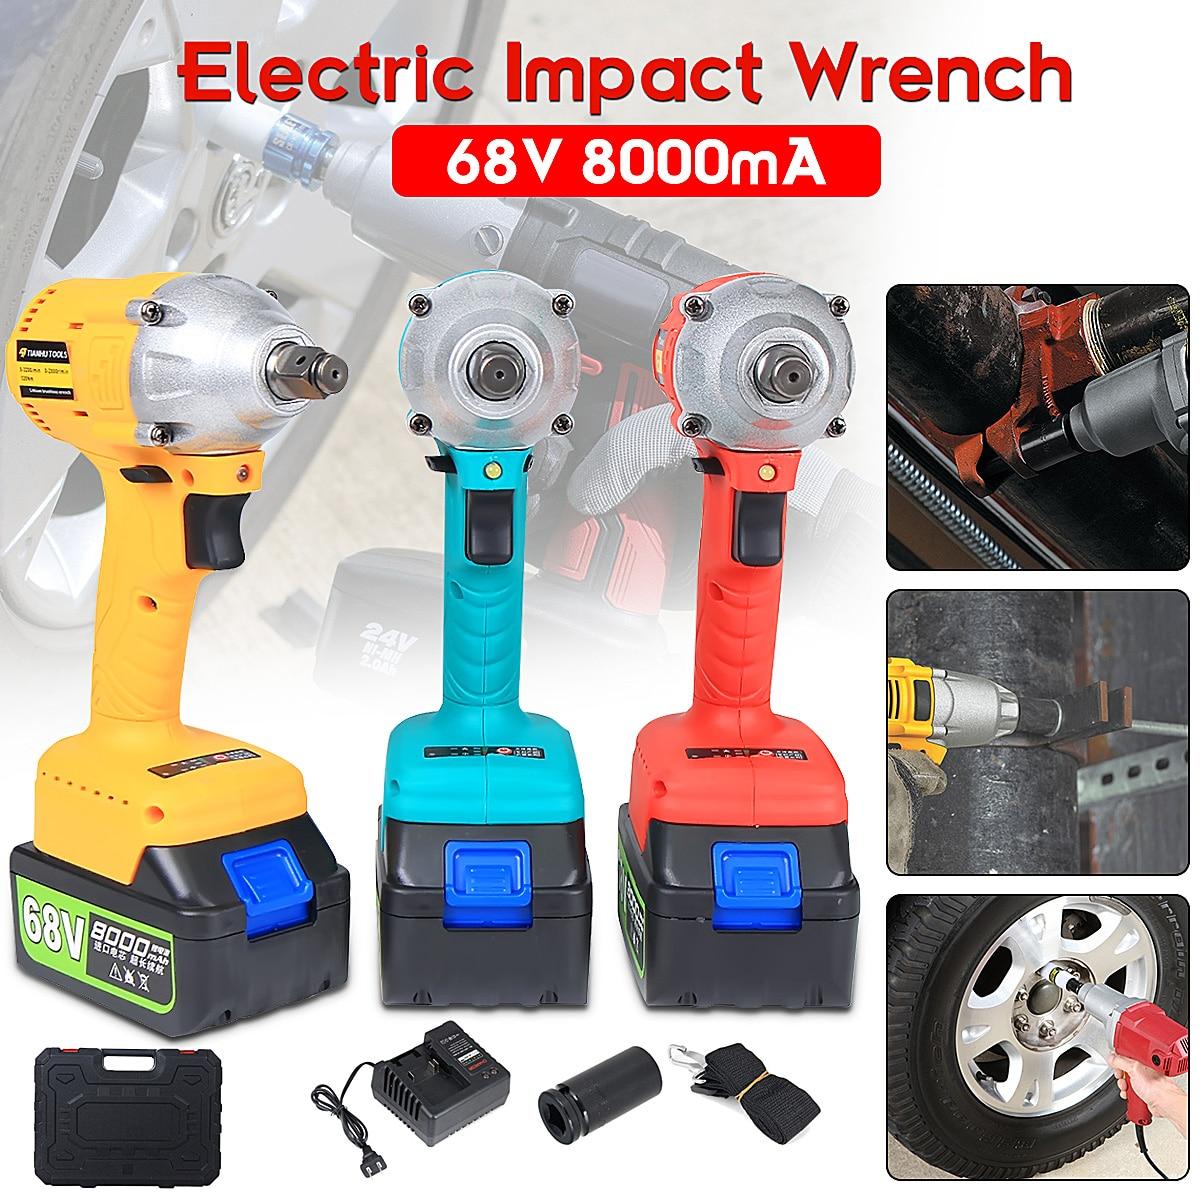 Brushless/ Cordless Electric Wrench Impact Socket Wrench 68V 8000mAh Li Battery Hand Drill Installation Power Tools цена